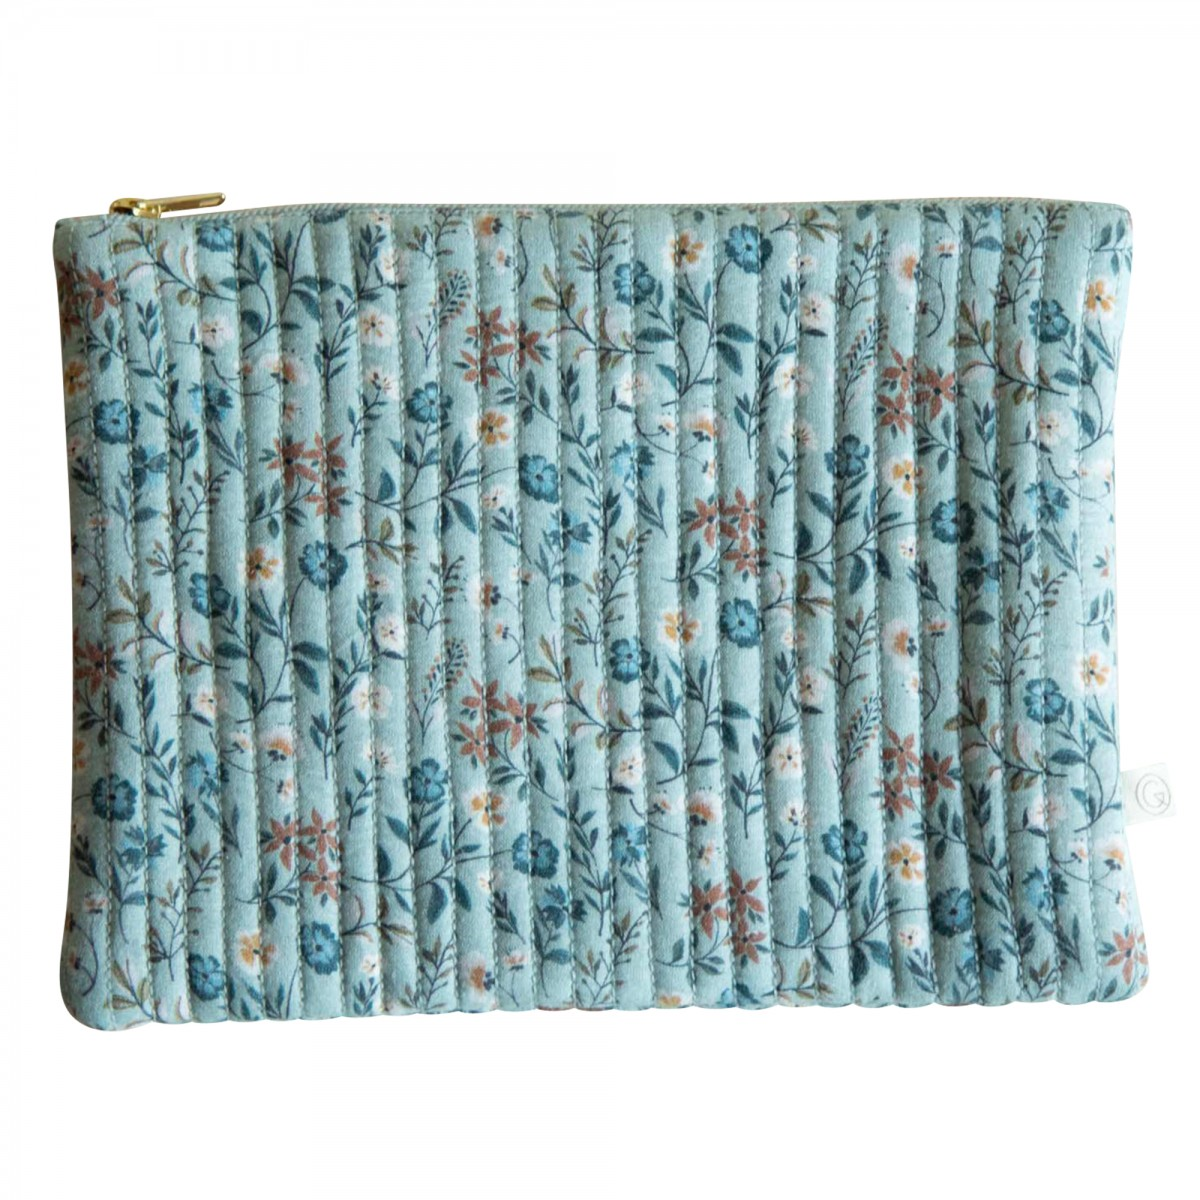 Grande pochette en coton imprimé fleuri bleu